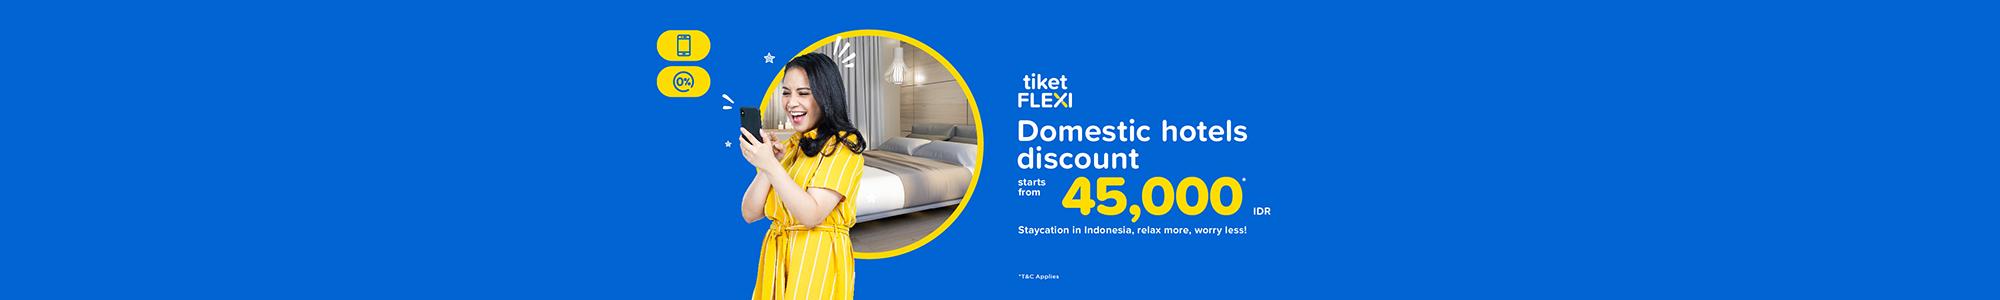 Promo tiket FLEXI hotel, Voucher Mulai 45rb - tiket.com